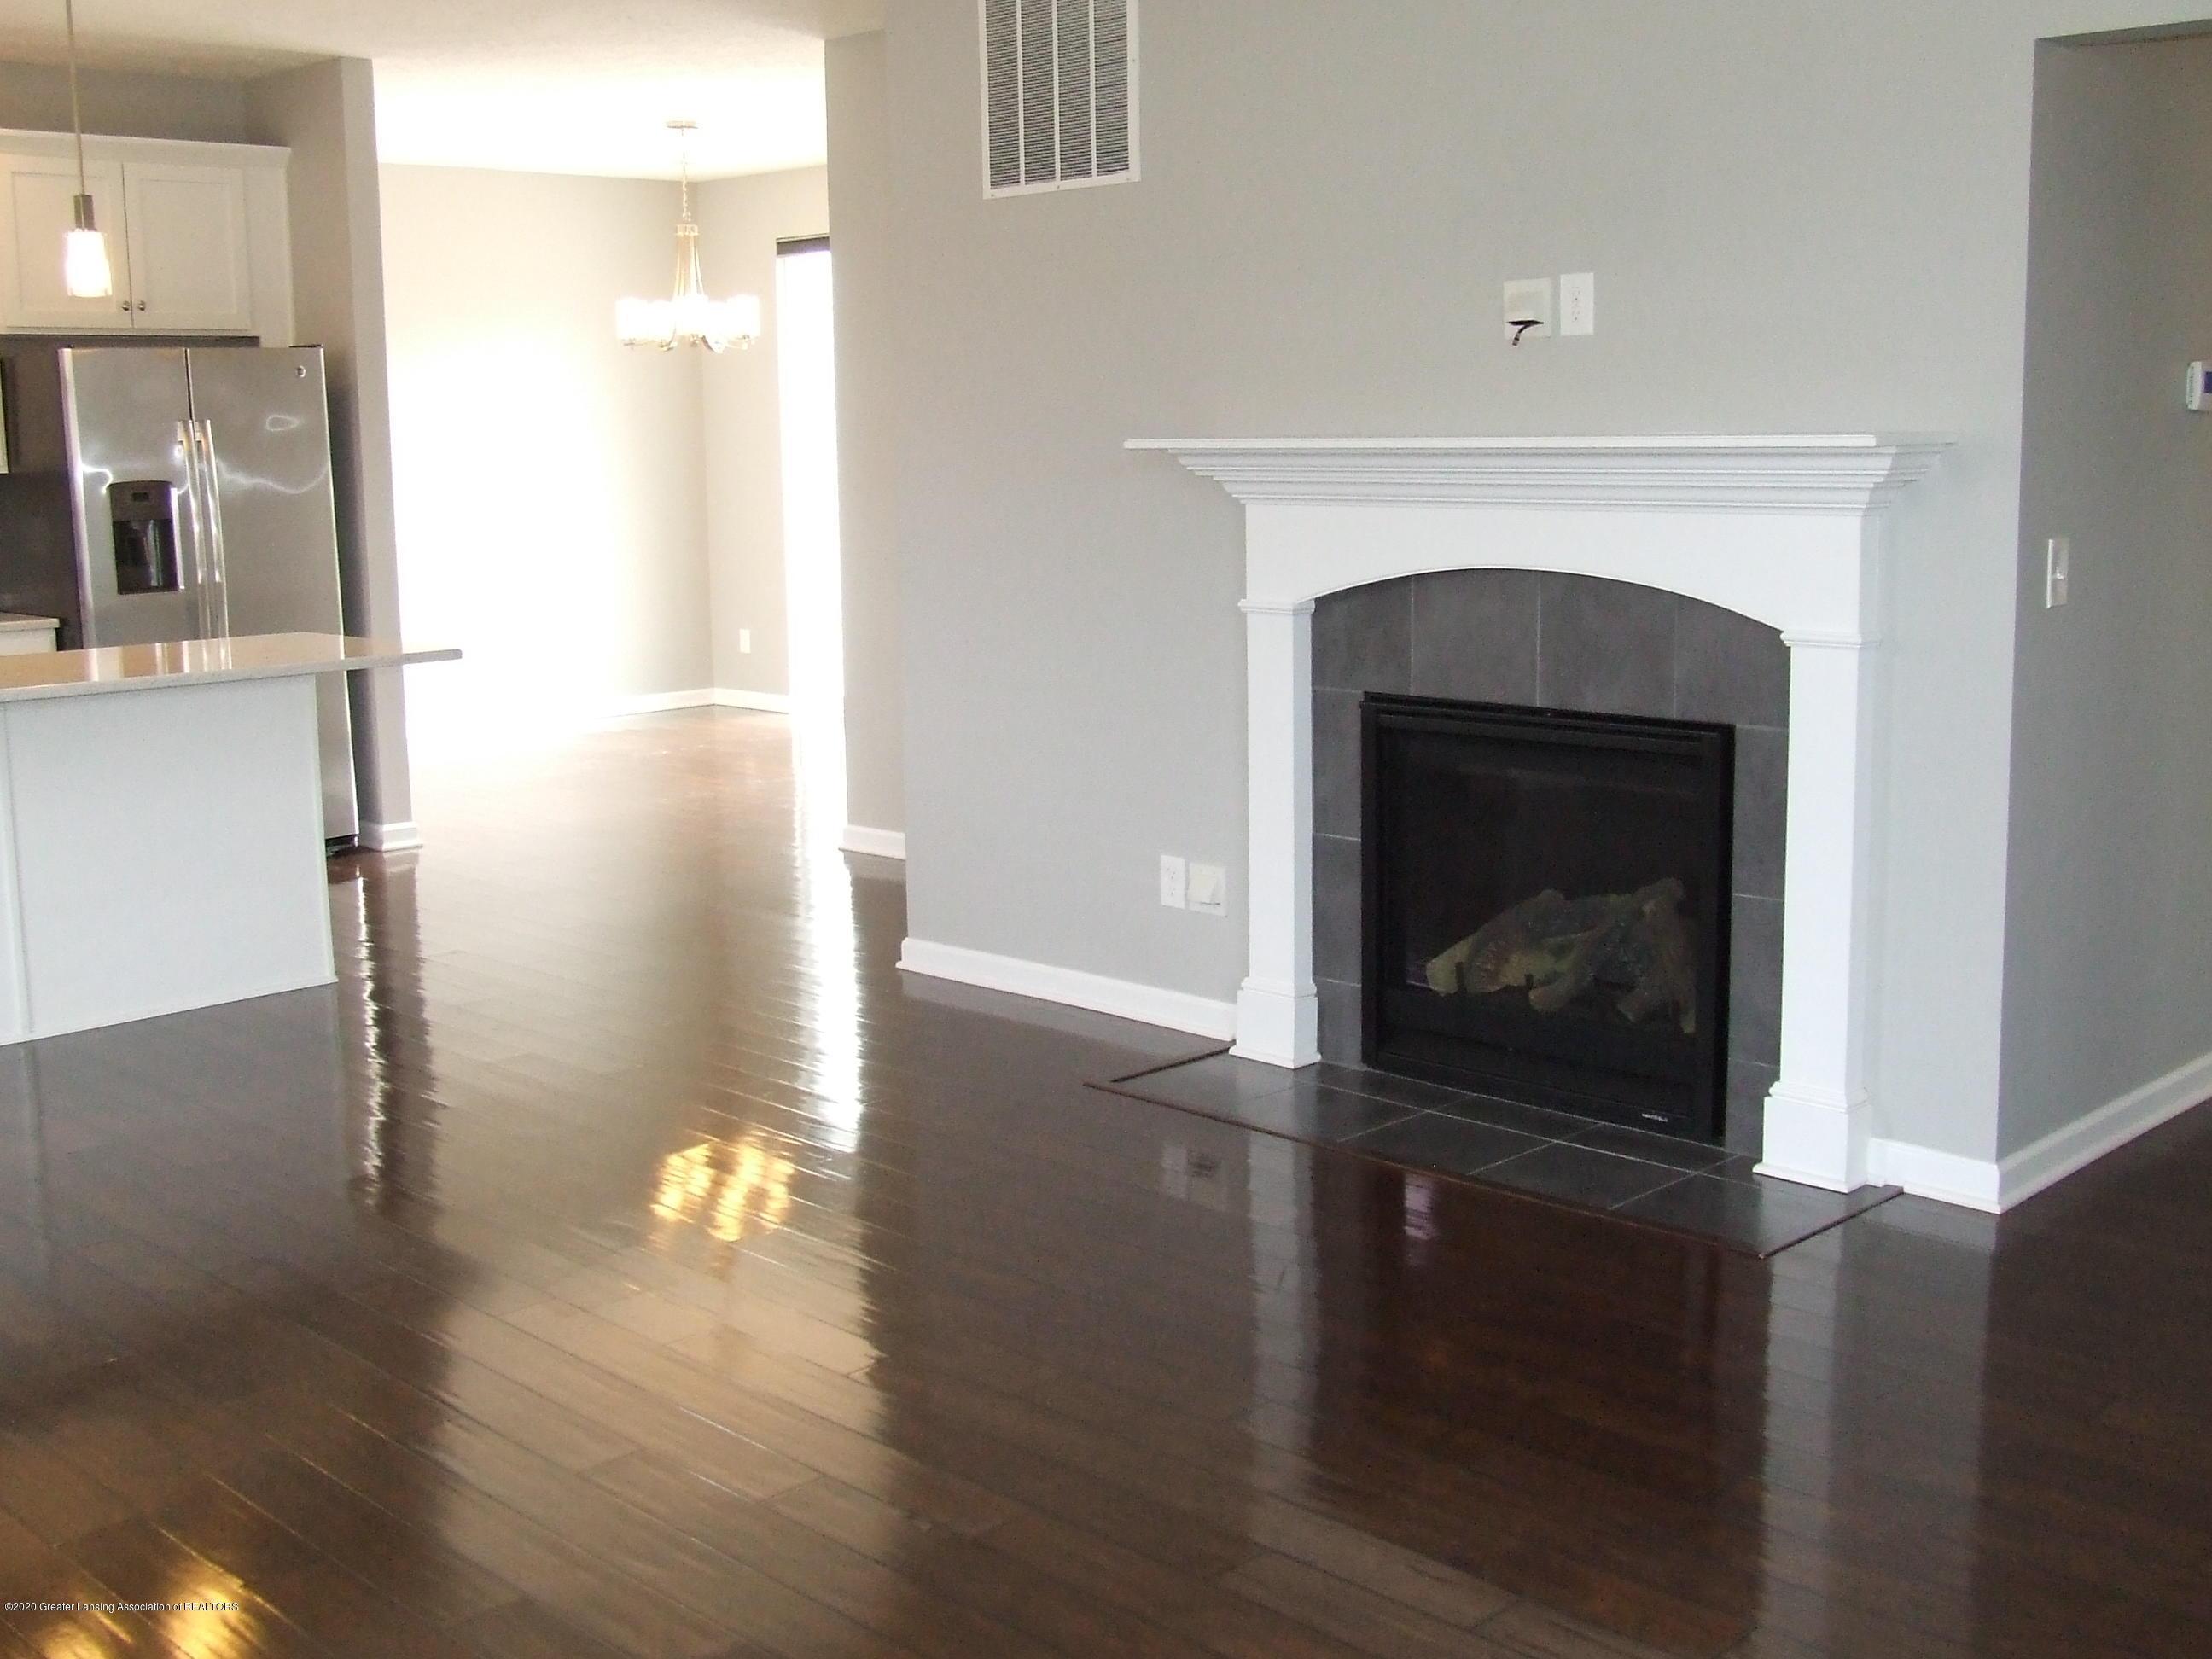 3174 Hamlet Cir - Living room/fireplace - 13